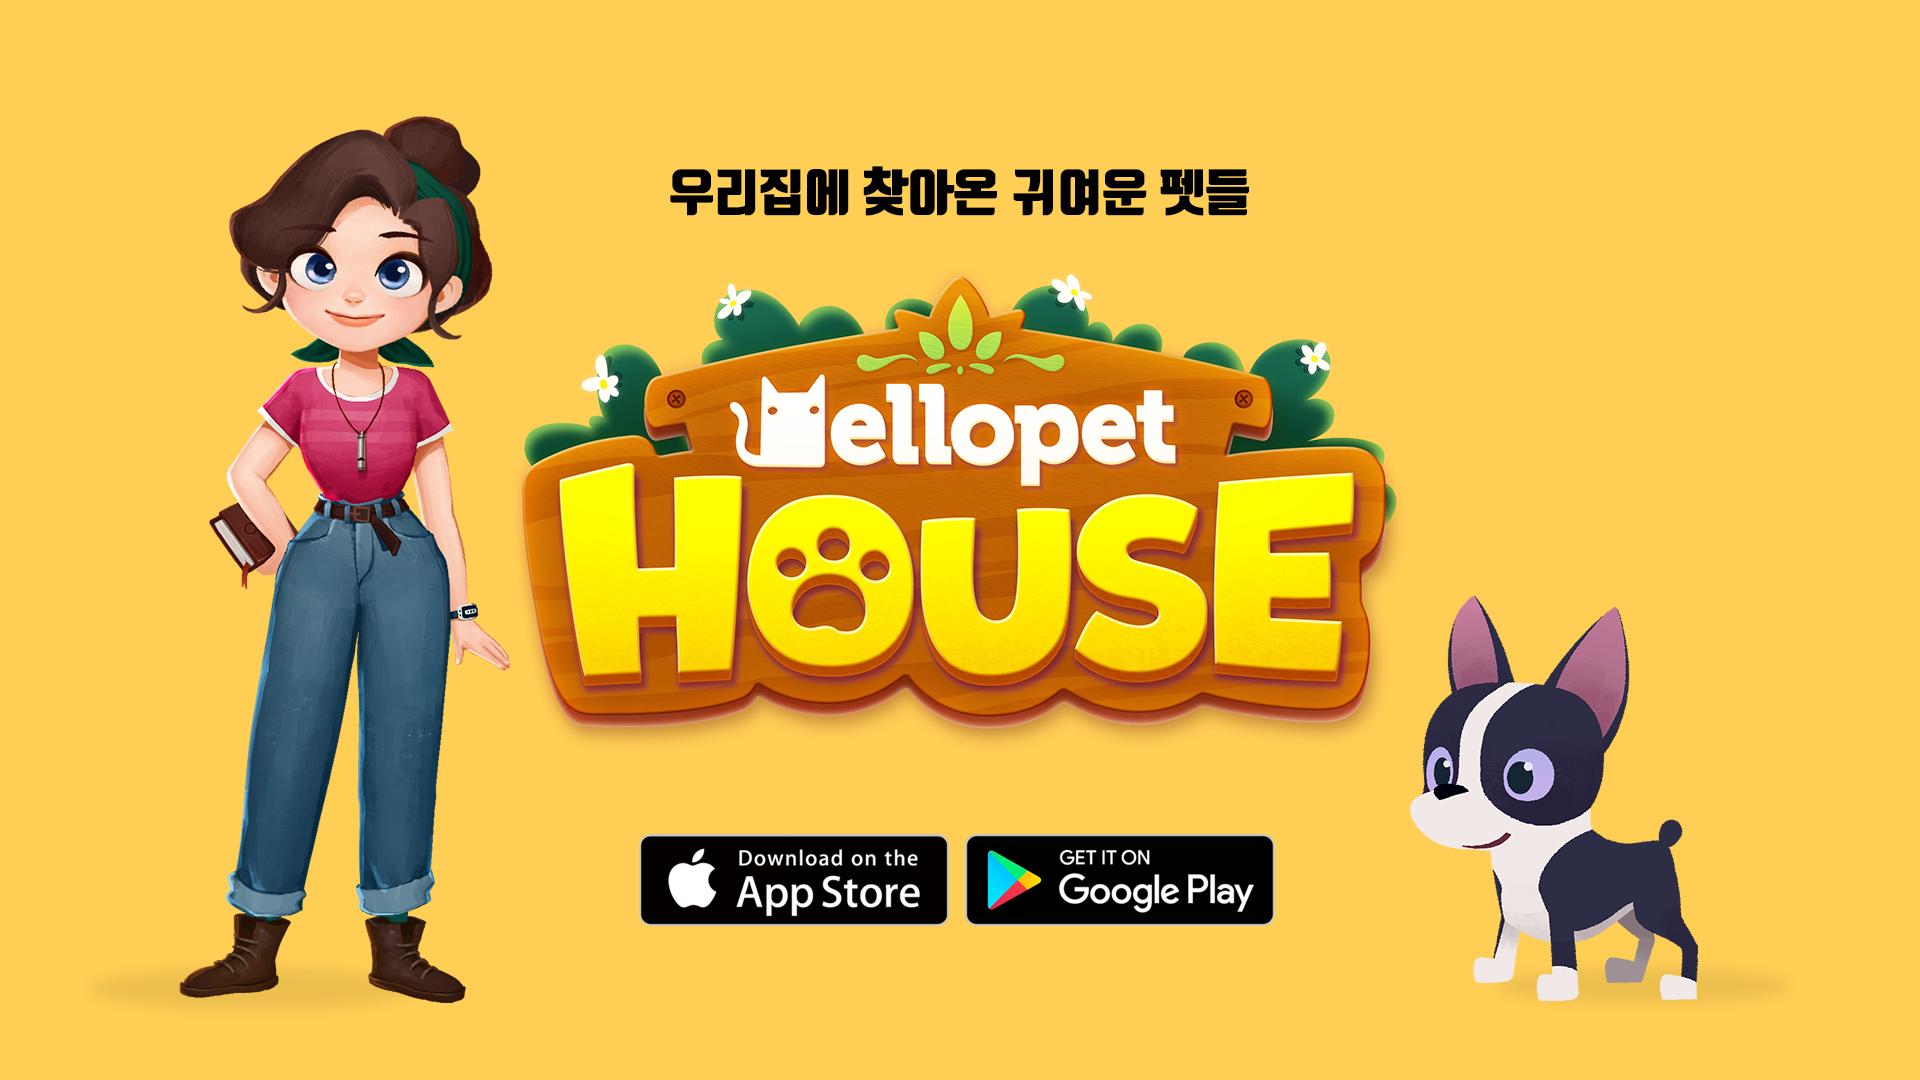 [MWU Korea 2019]헬로펫 하우스(Hellopet House) / 나날이스튜디오